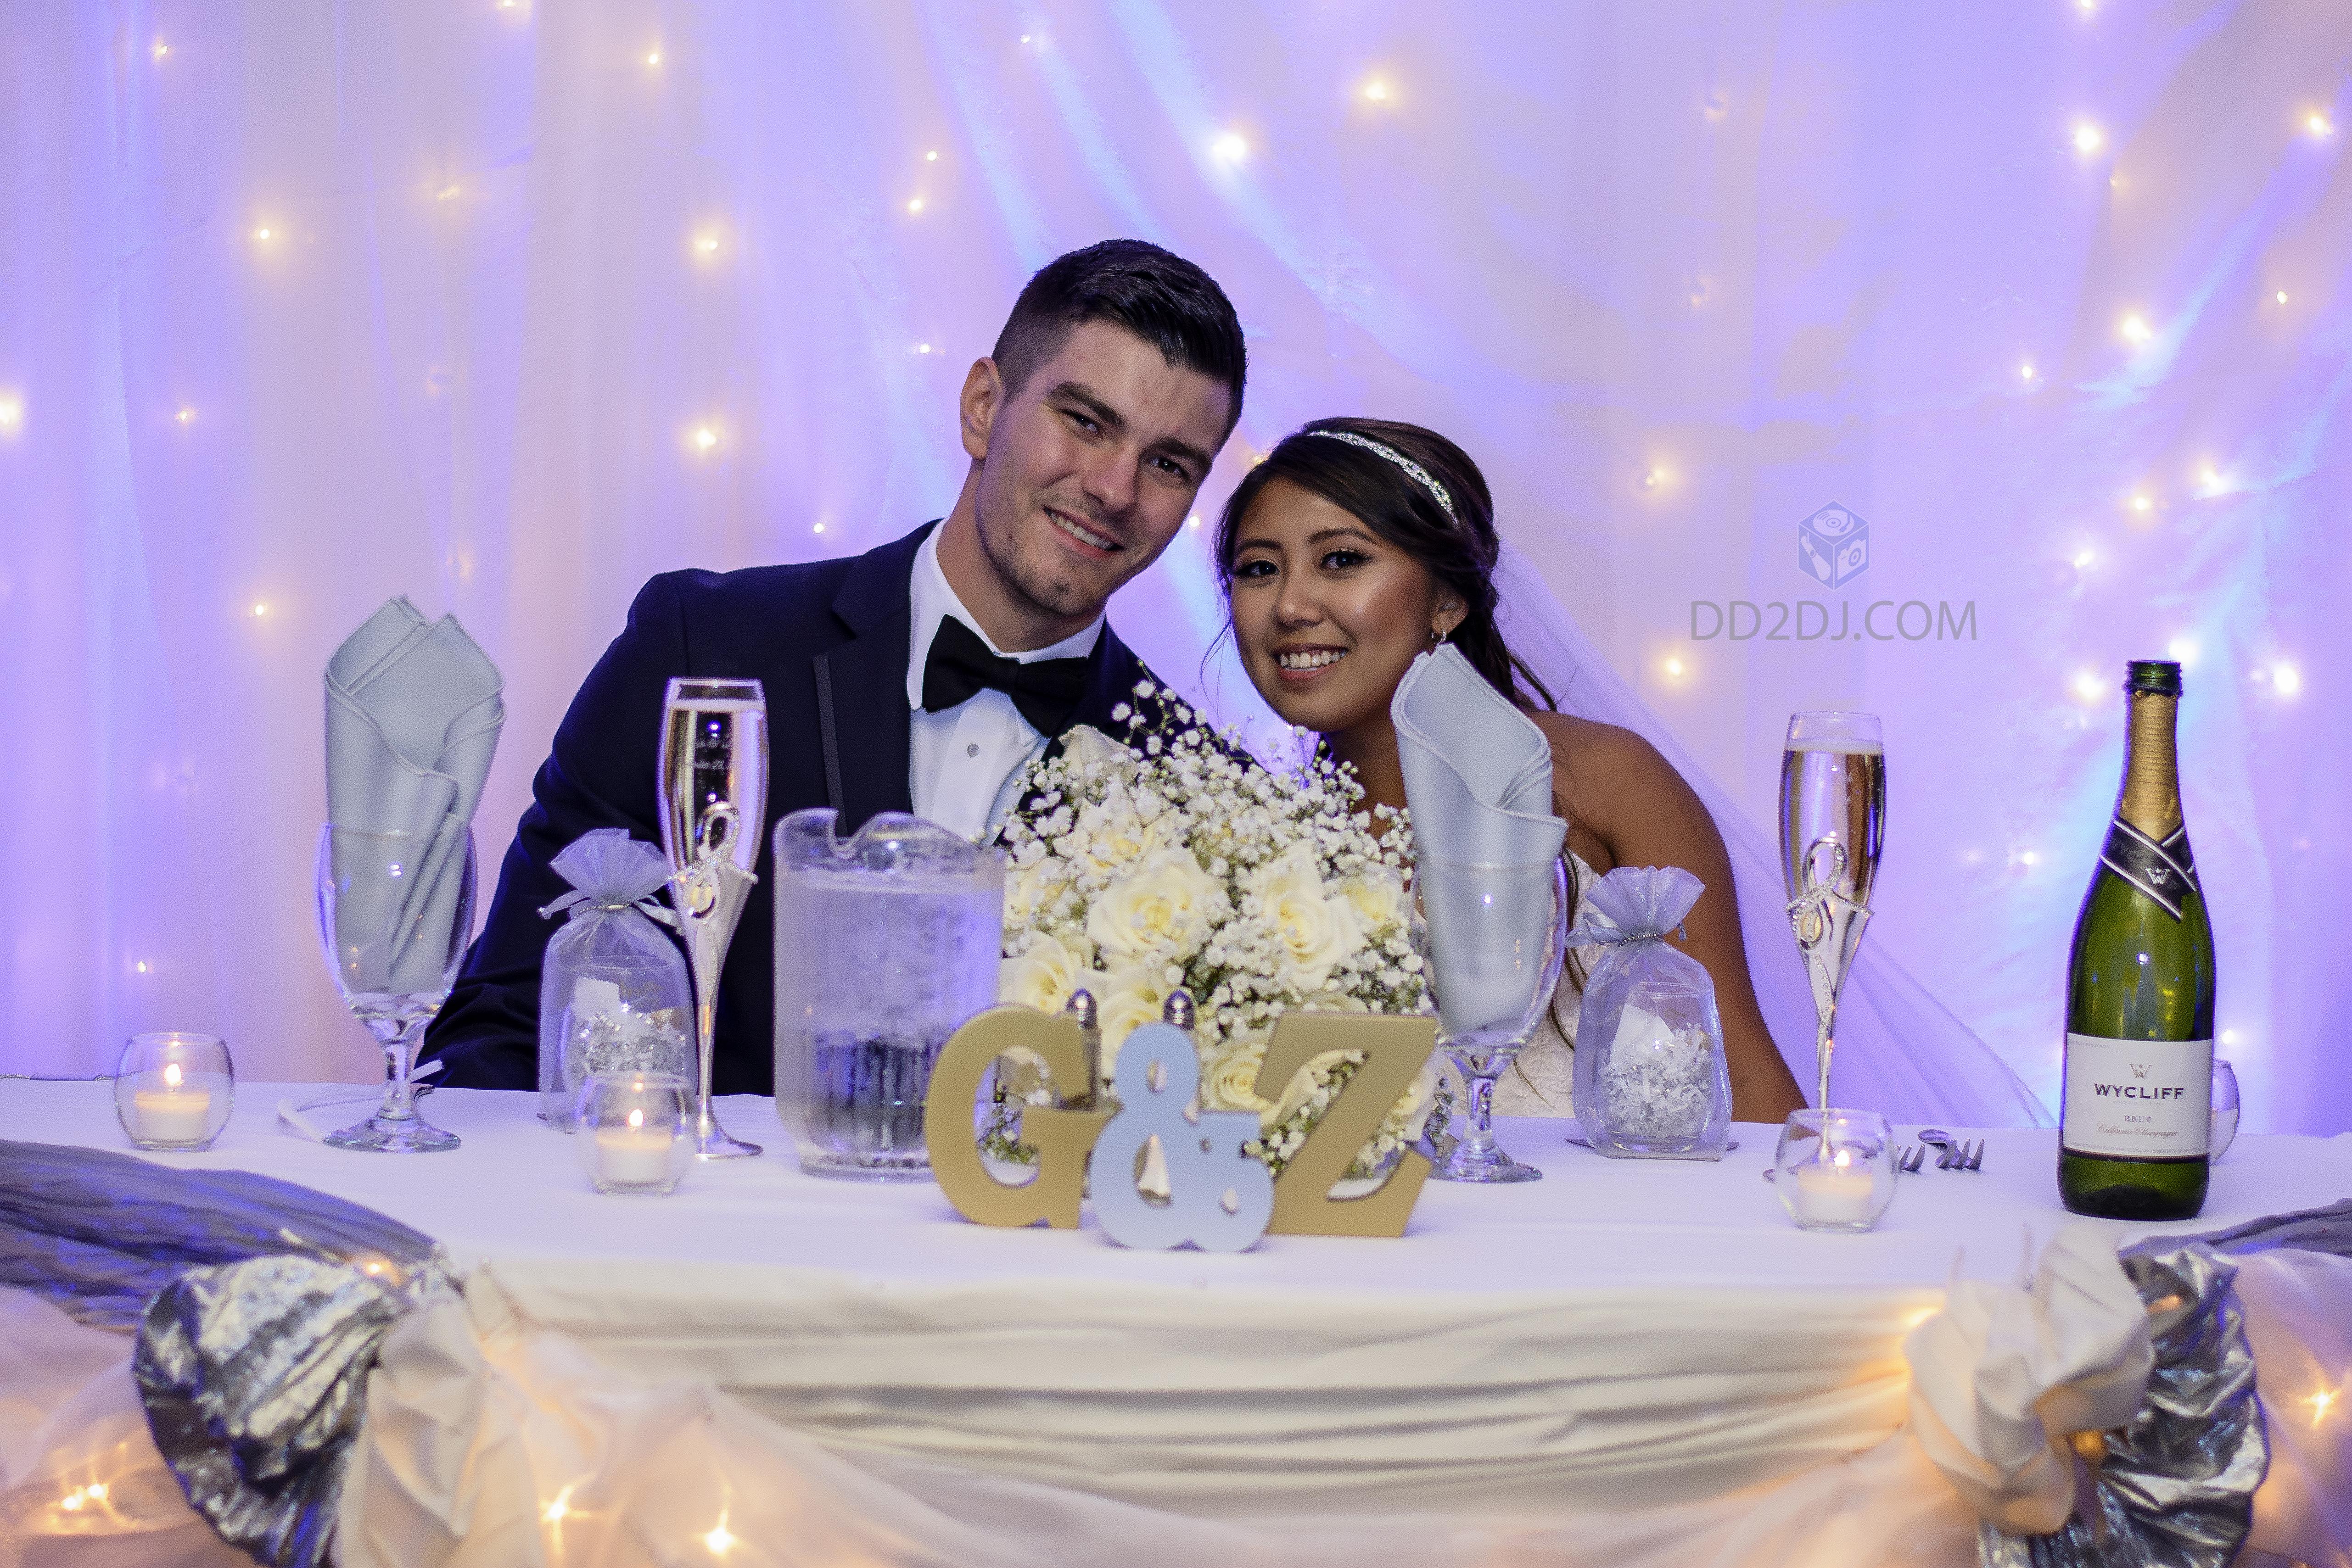 Wedding photography in michigan, michigan wedding photography, best wedding photographer